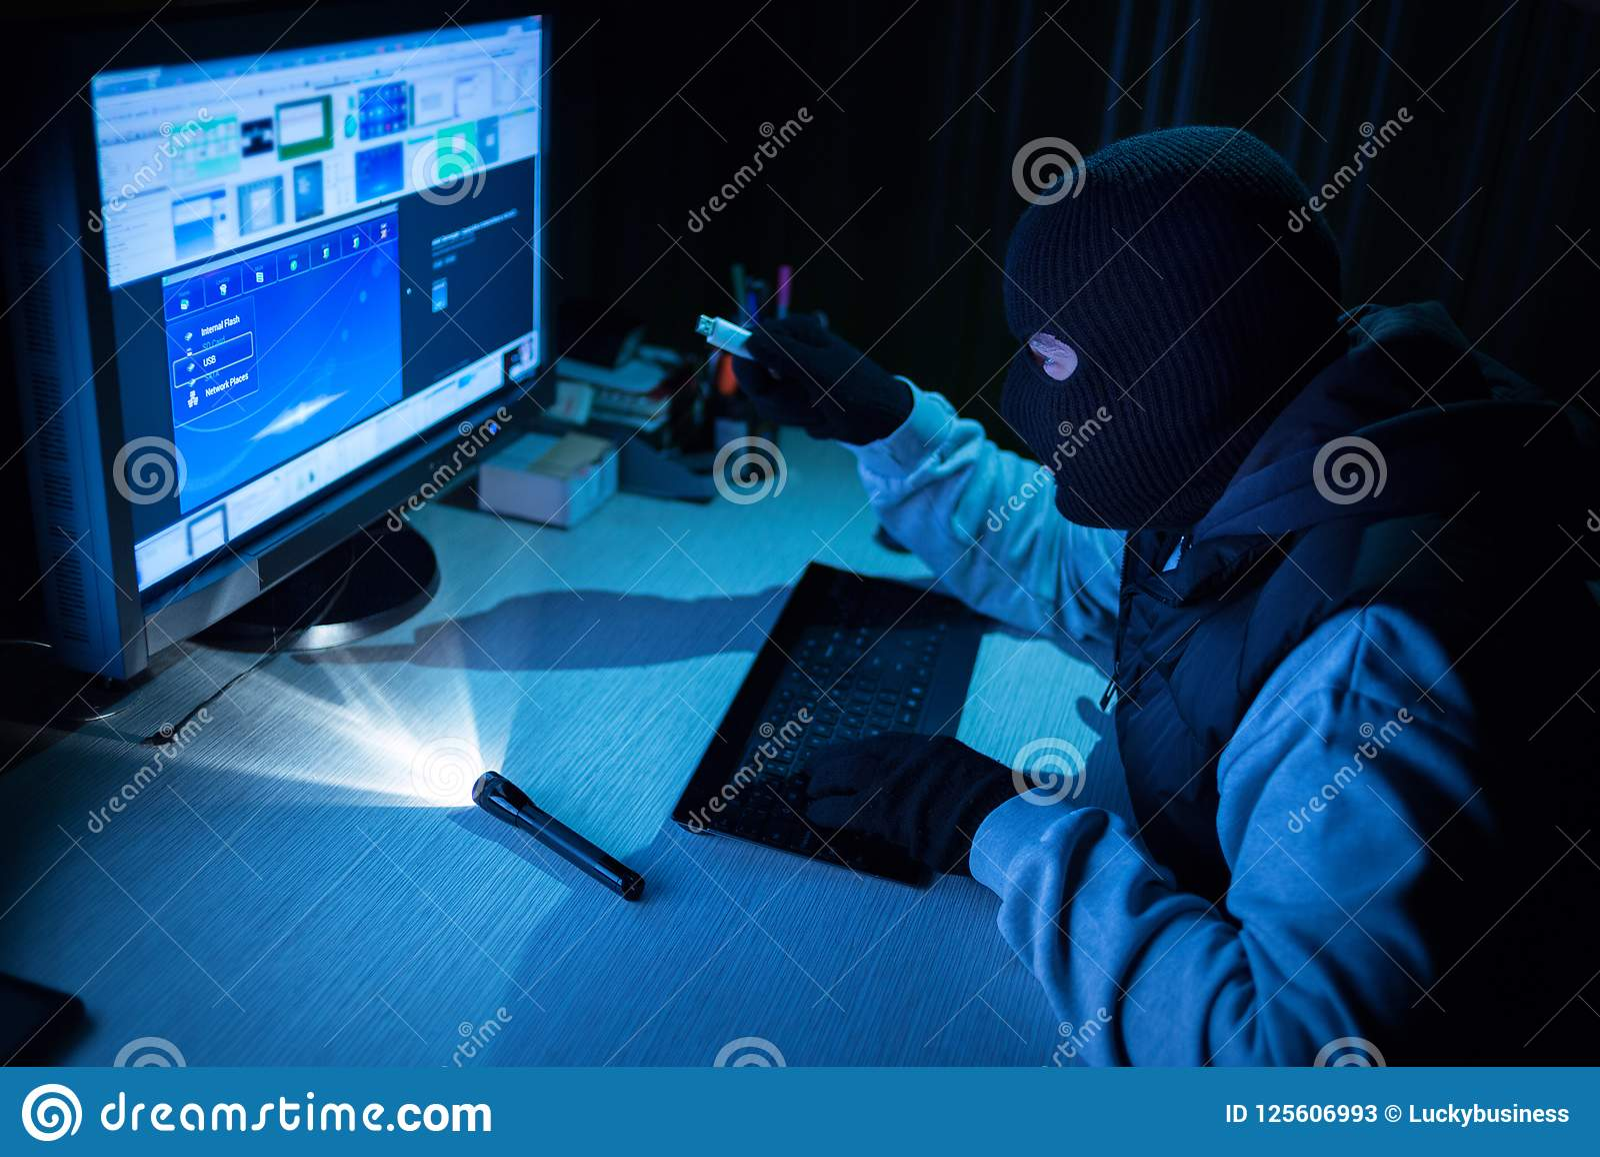 Burglar hacker entered password to broke into a computer